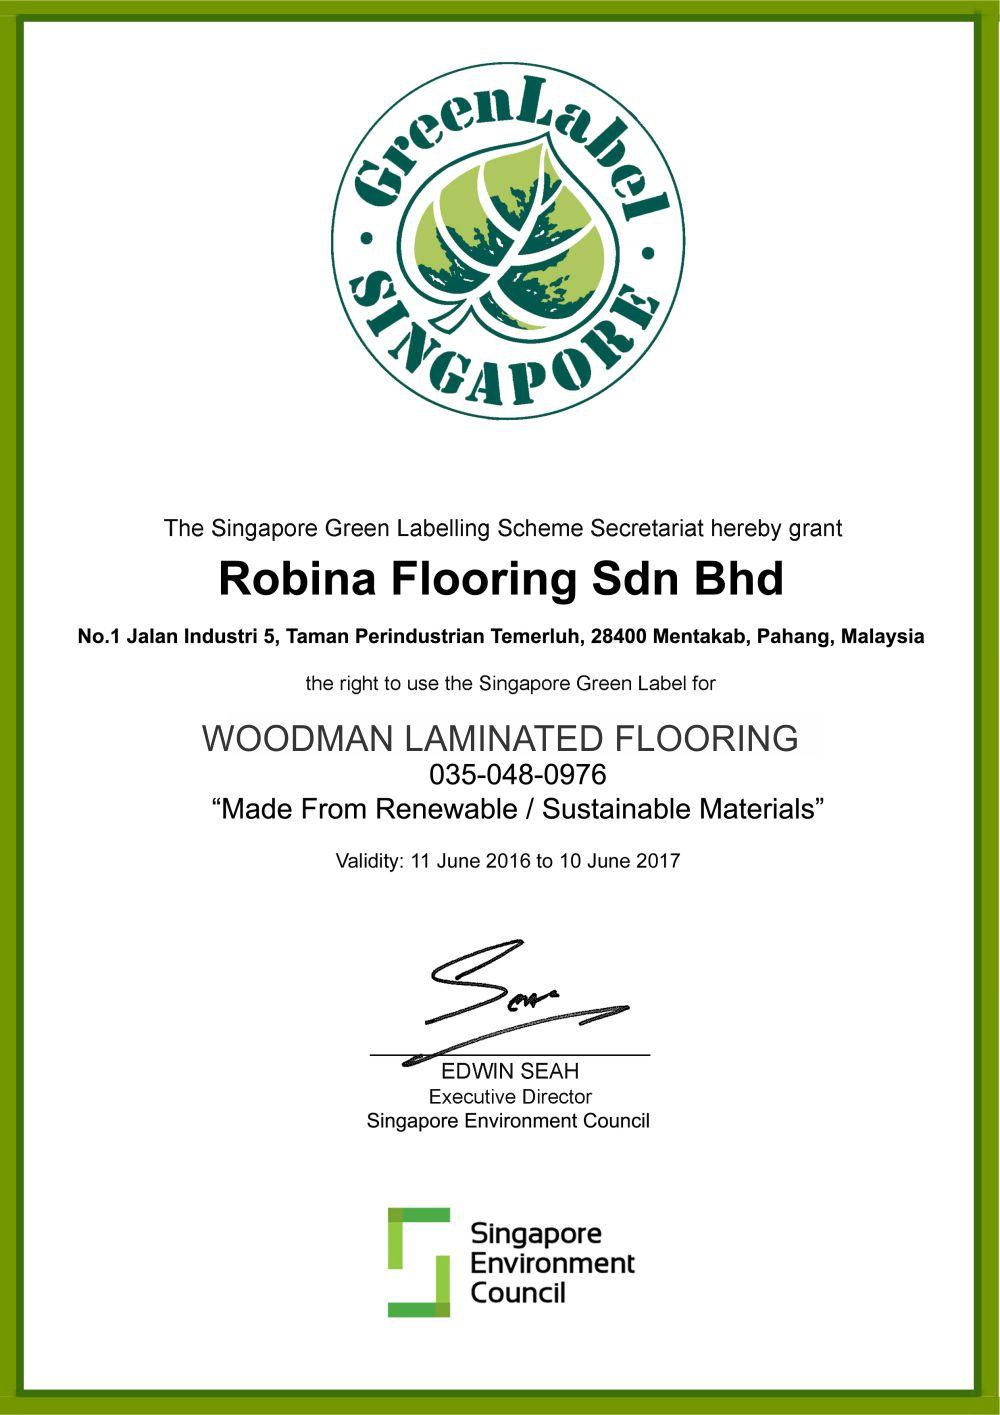 Singapore Green Label Scheme WOODMAN Laminated